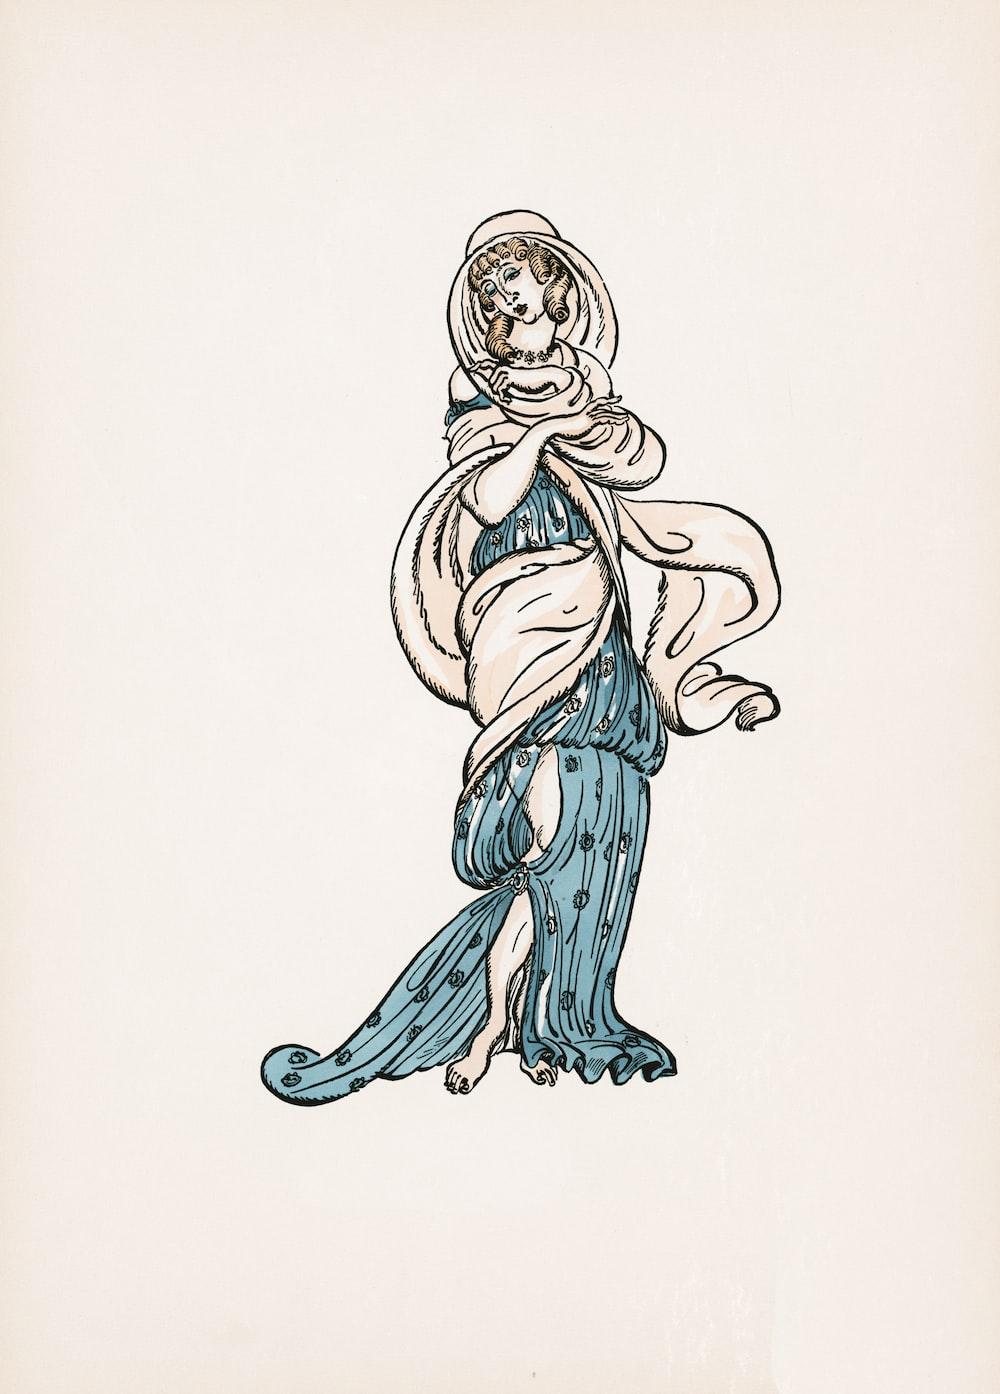 woman in blue dress illustration